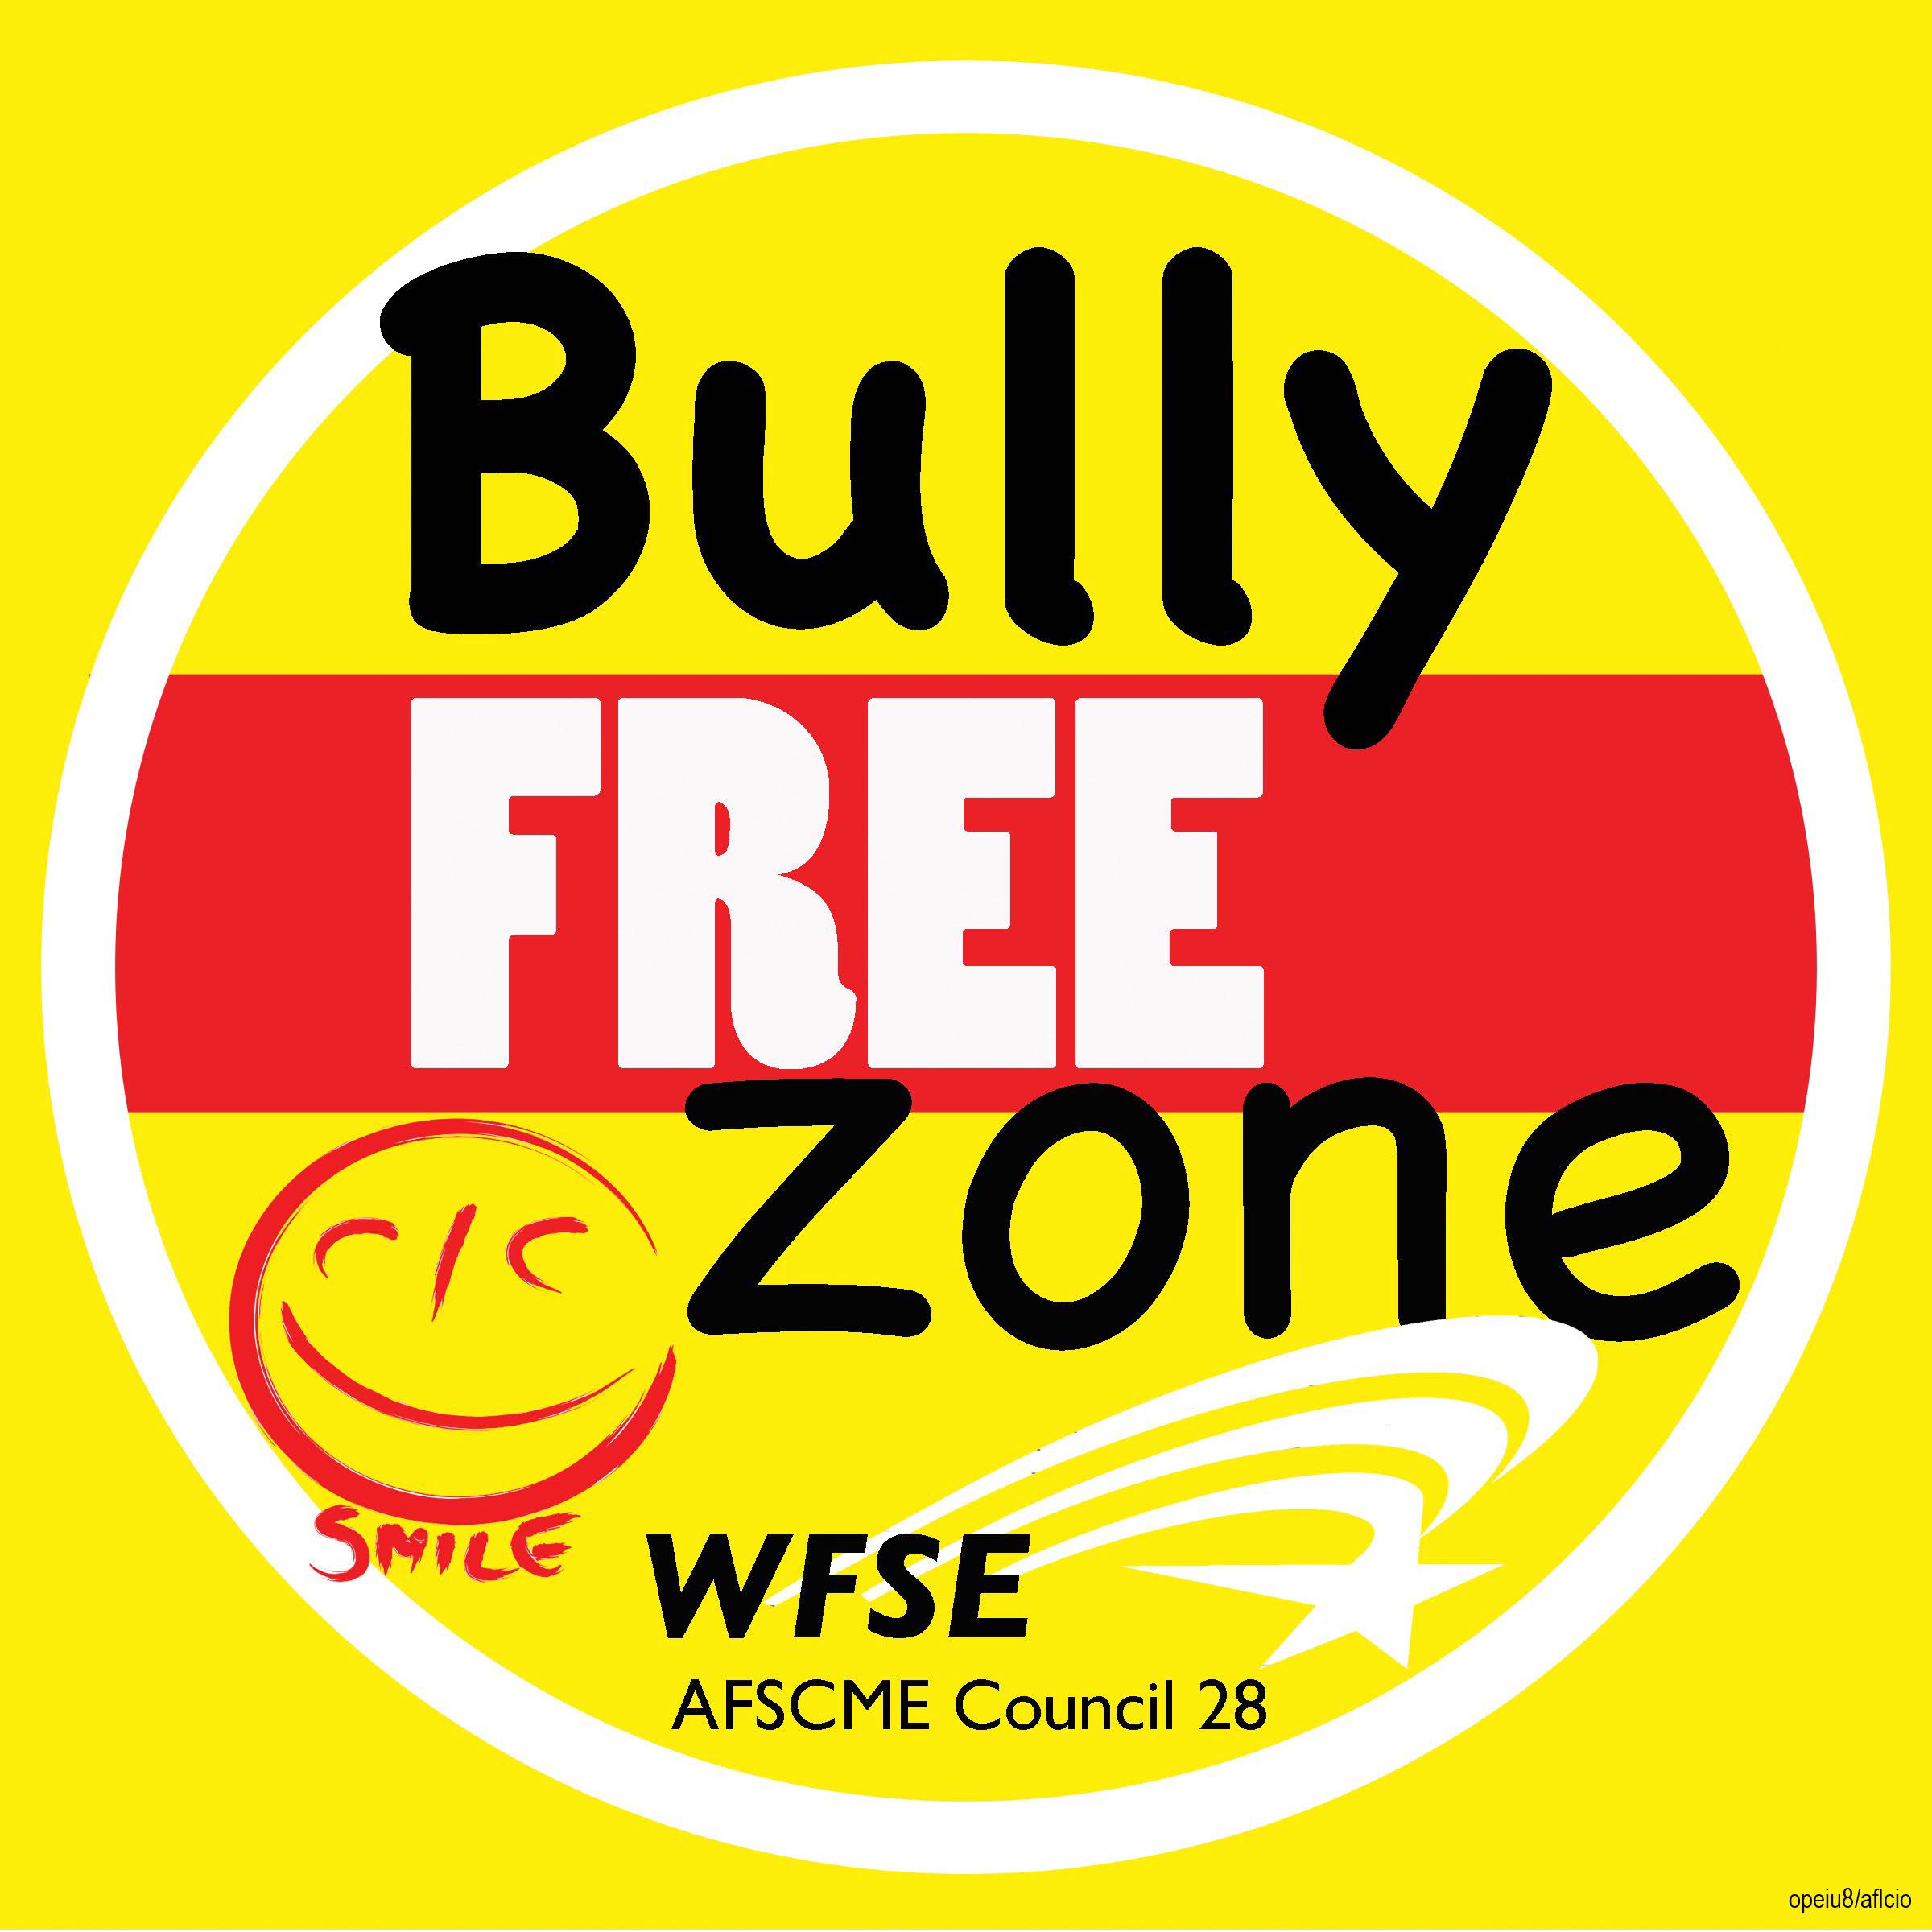 BullyFree Zone placard